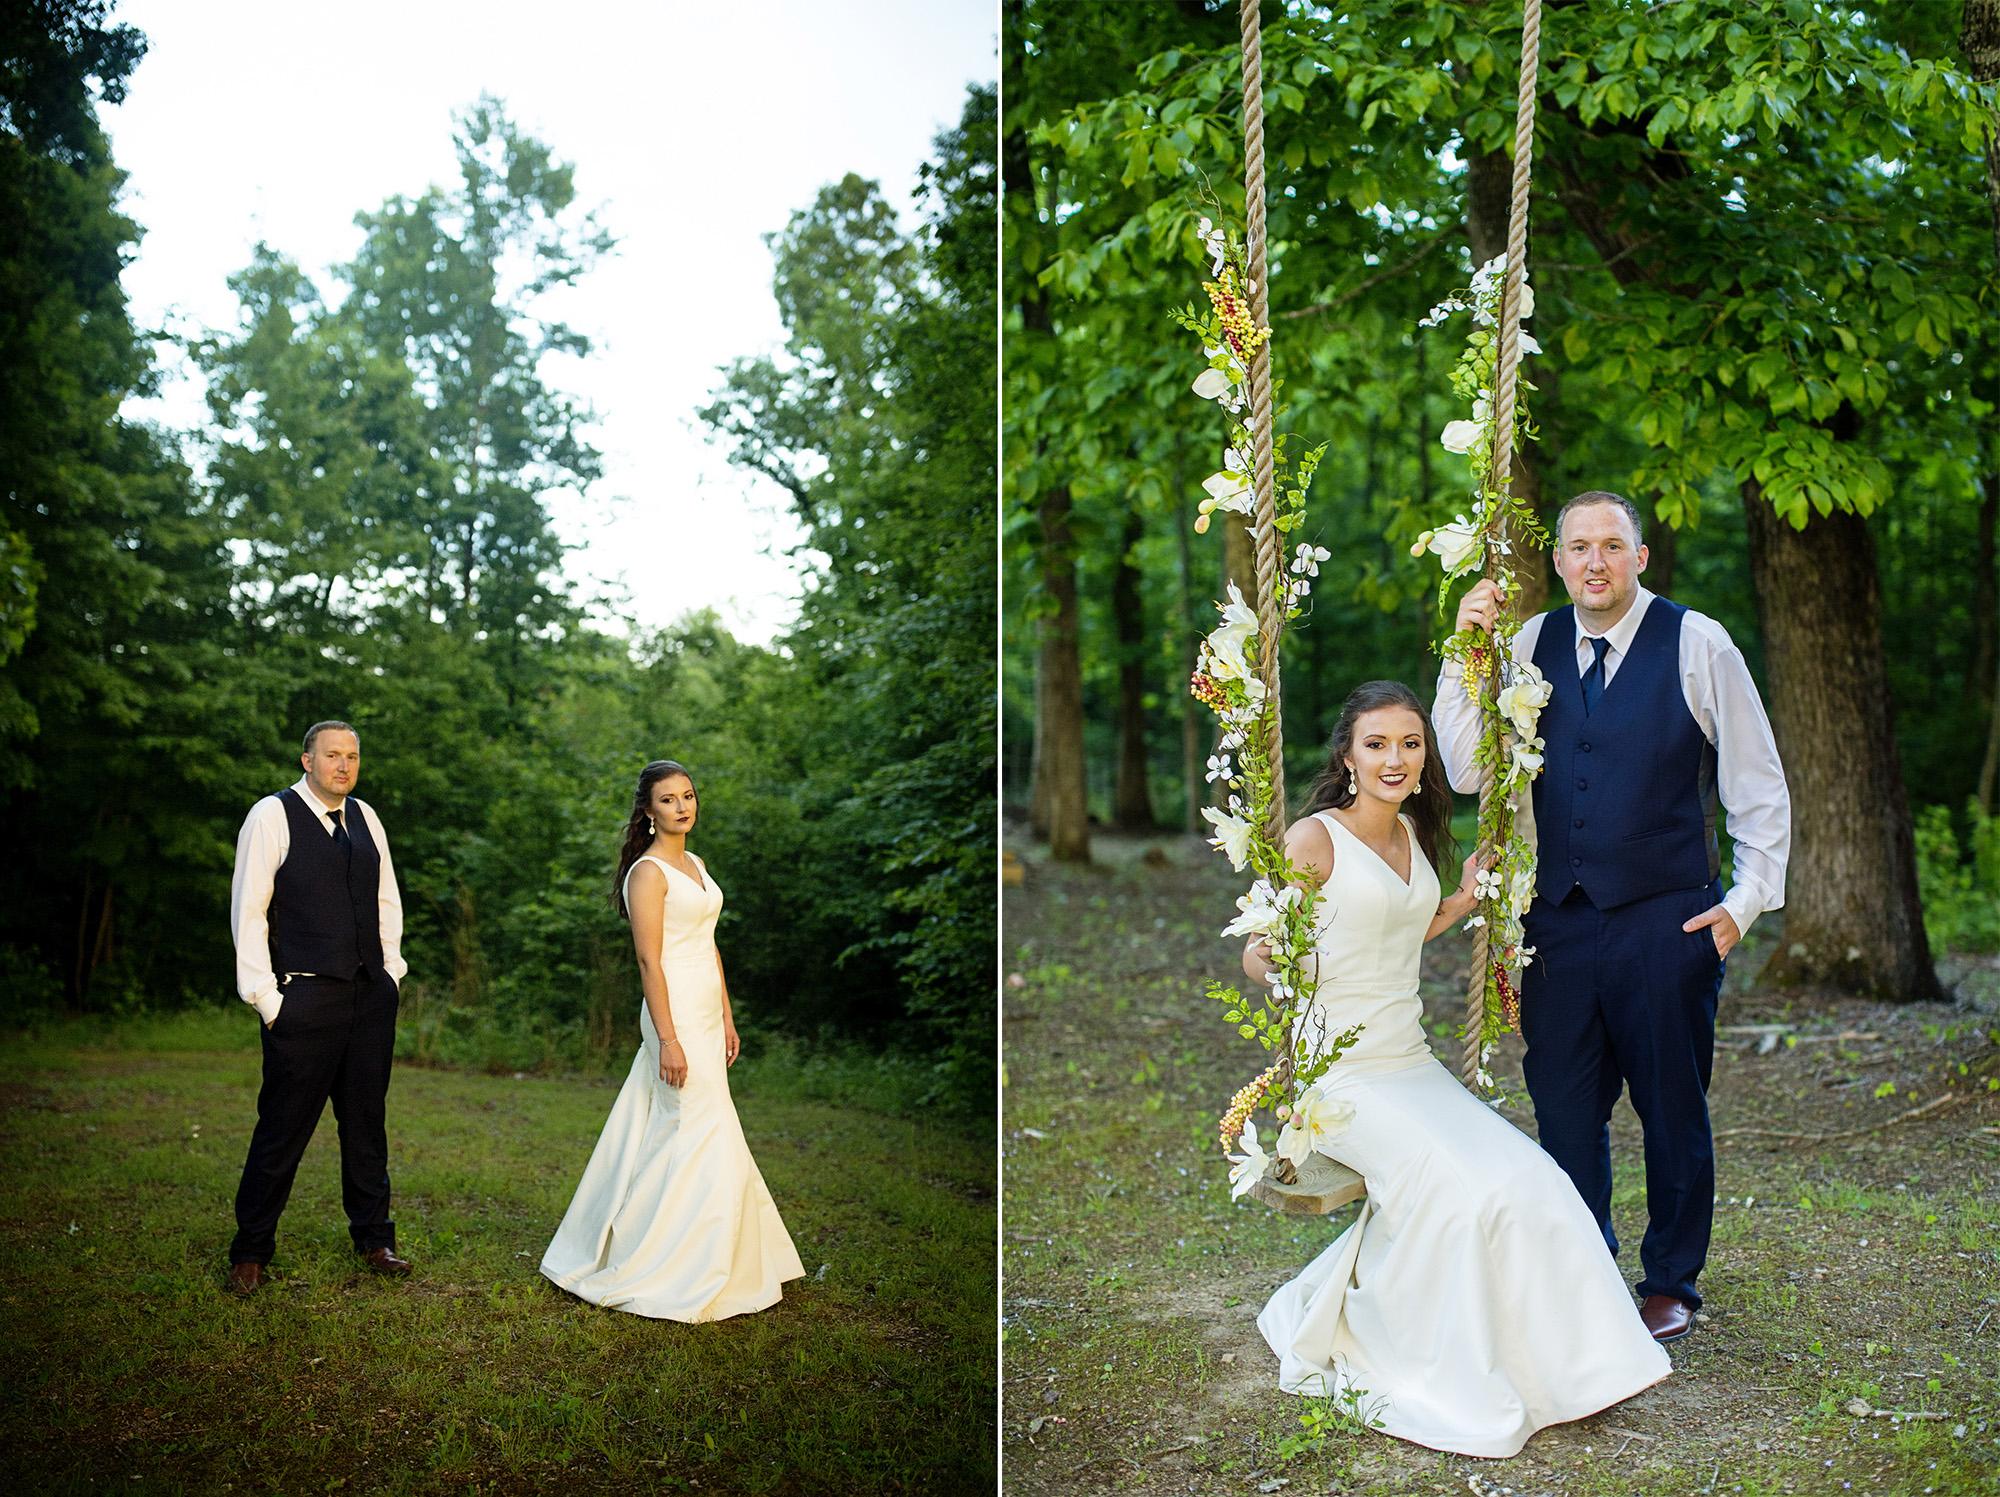 Seriously_Sabrina_Photography_Red_River_Gorge_Wedding_Barn_Robinson125.jpg